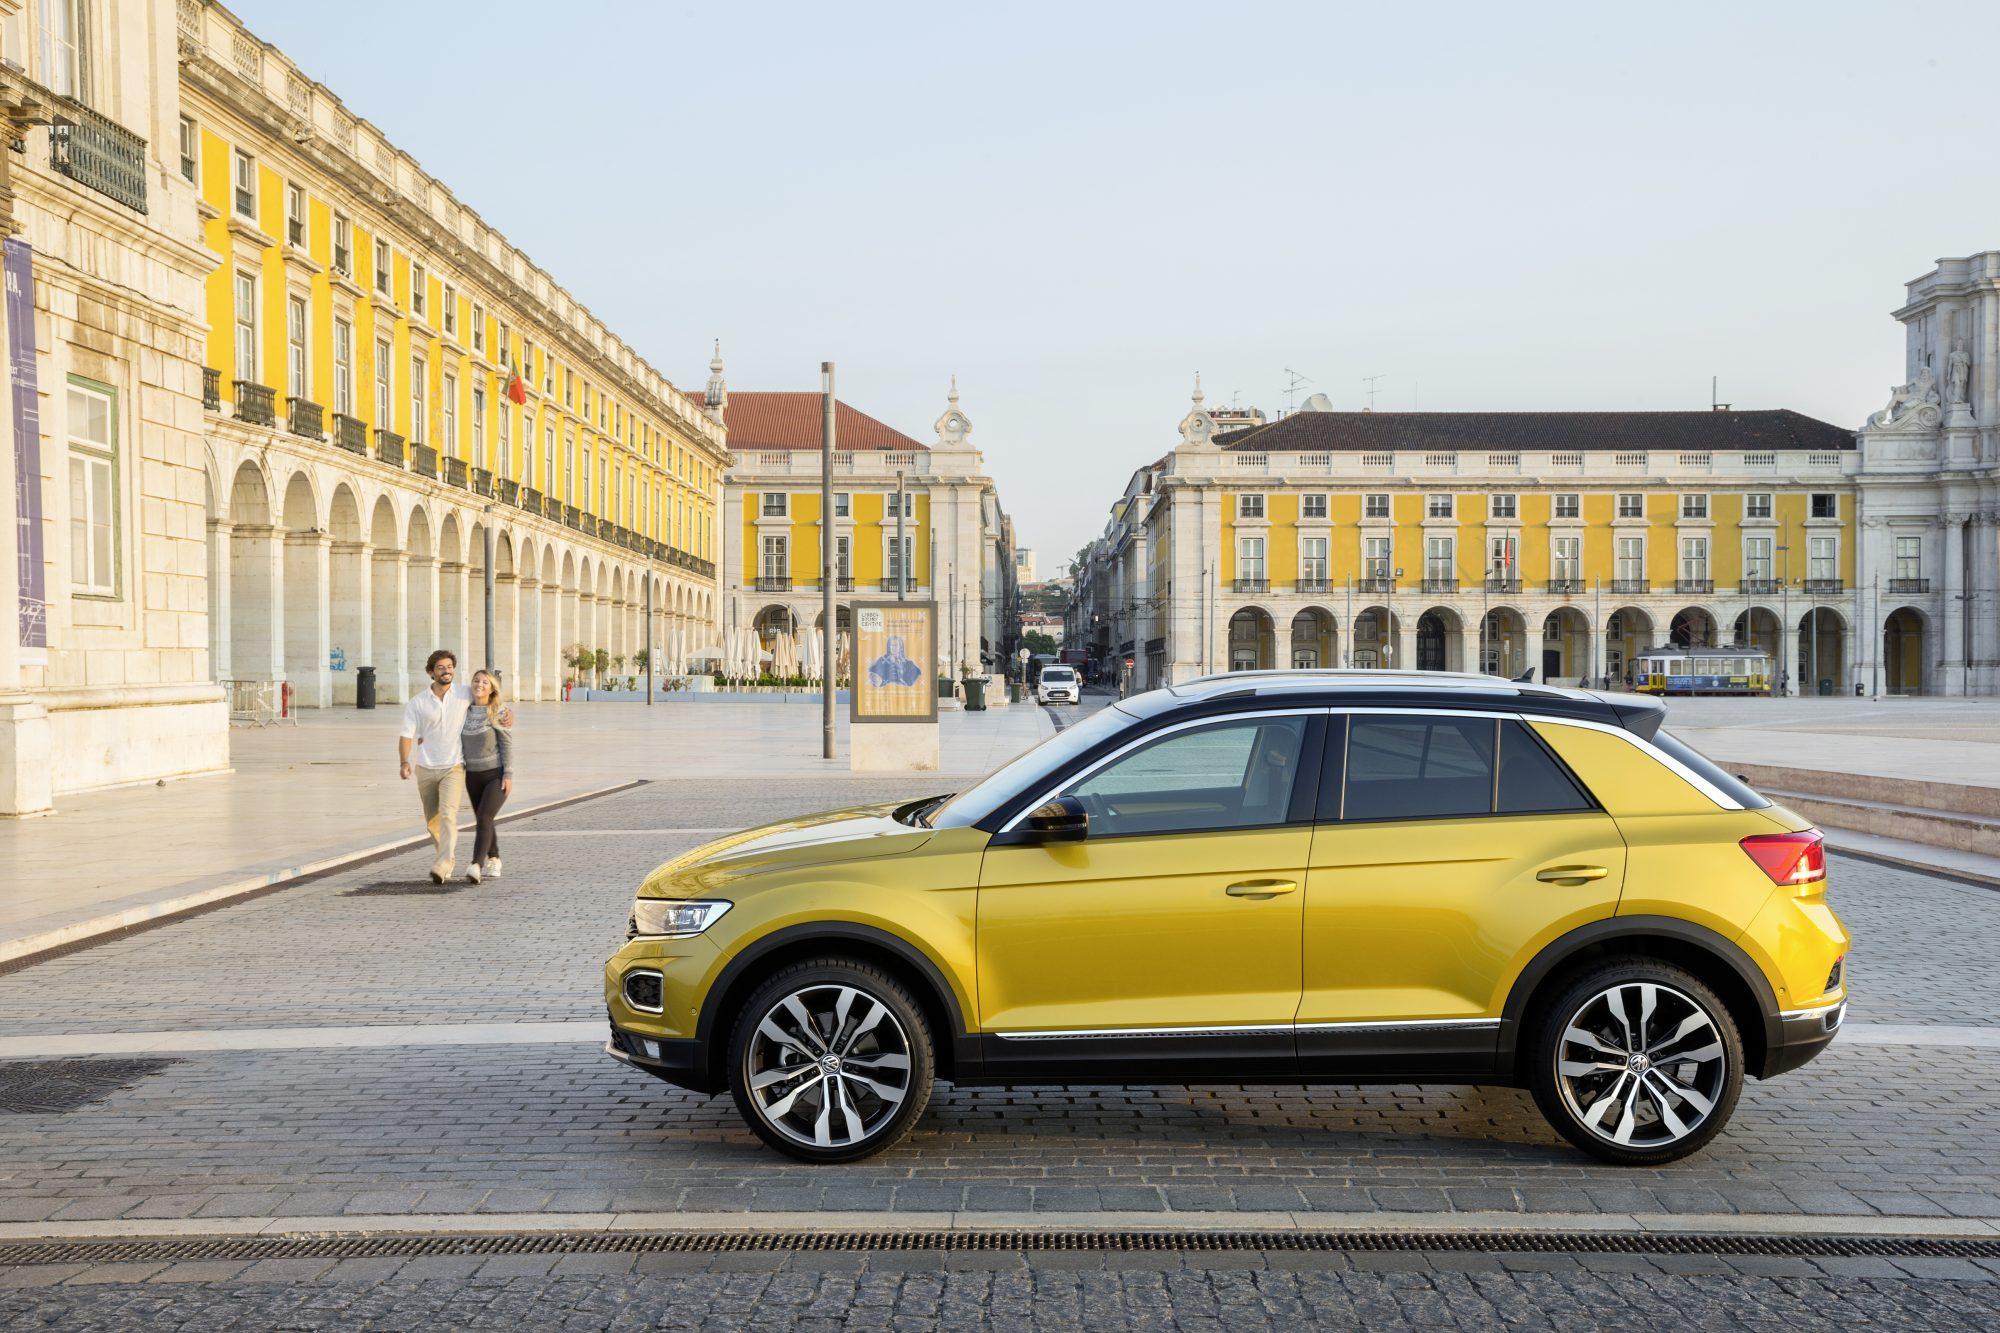 novo Volkswagen t-roc portugal